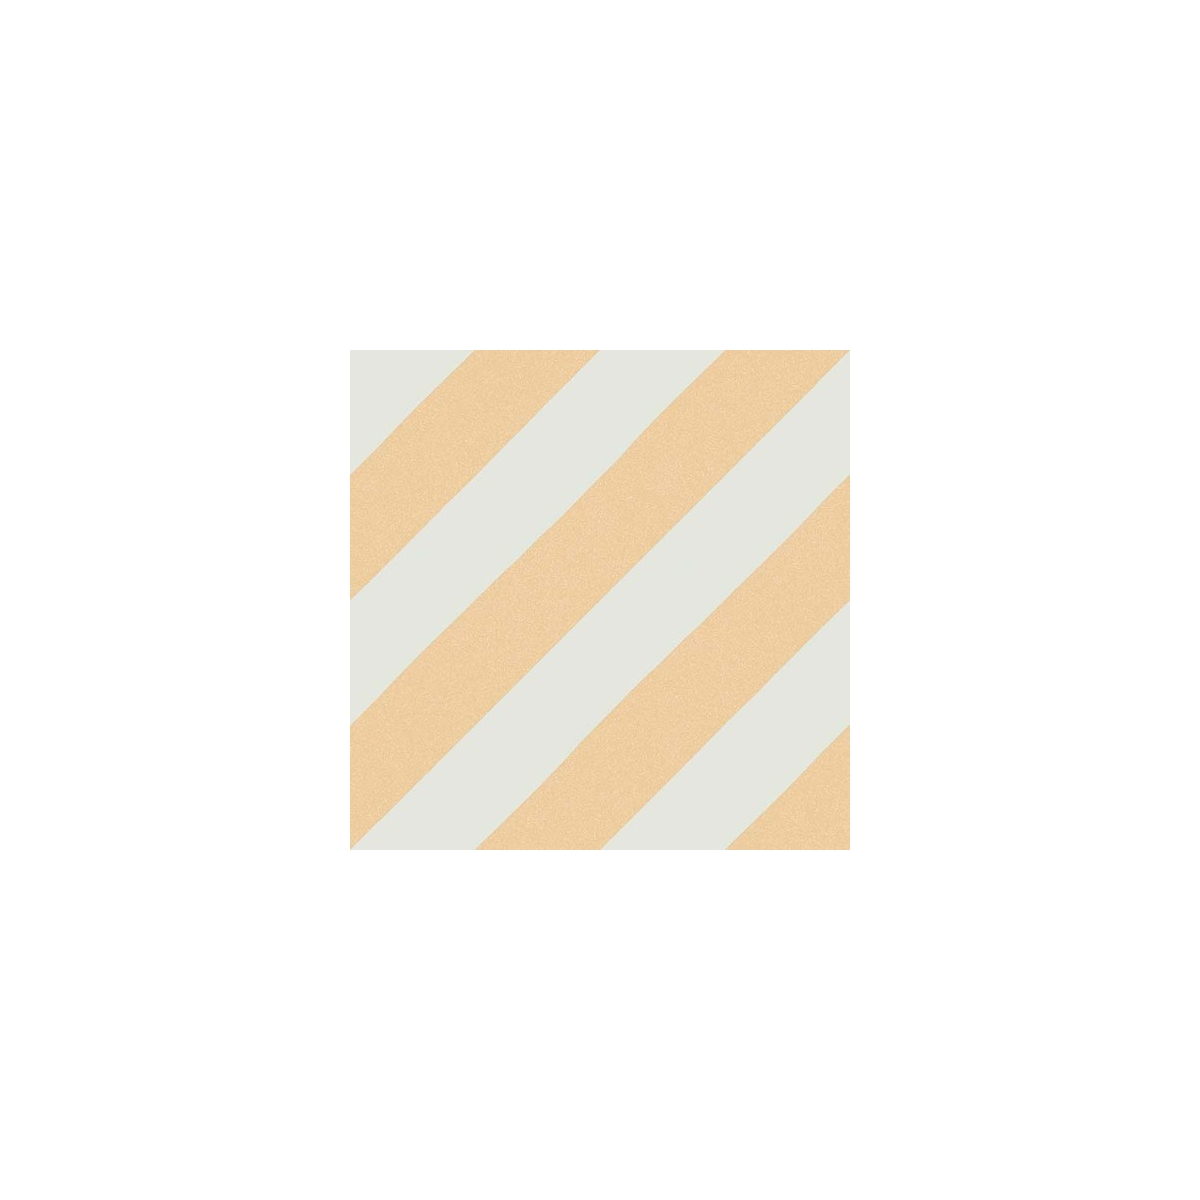 Suelo Goroka Ocre porcelánico antideslizante